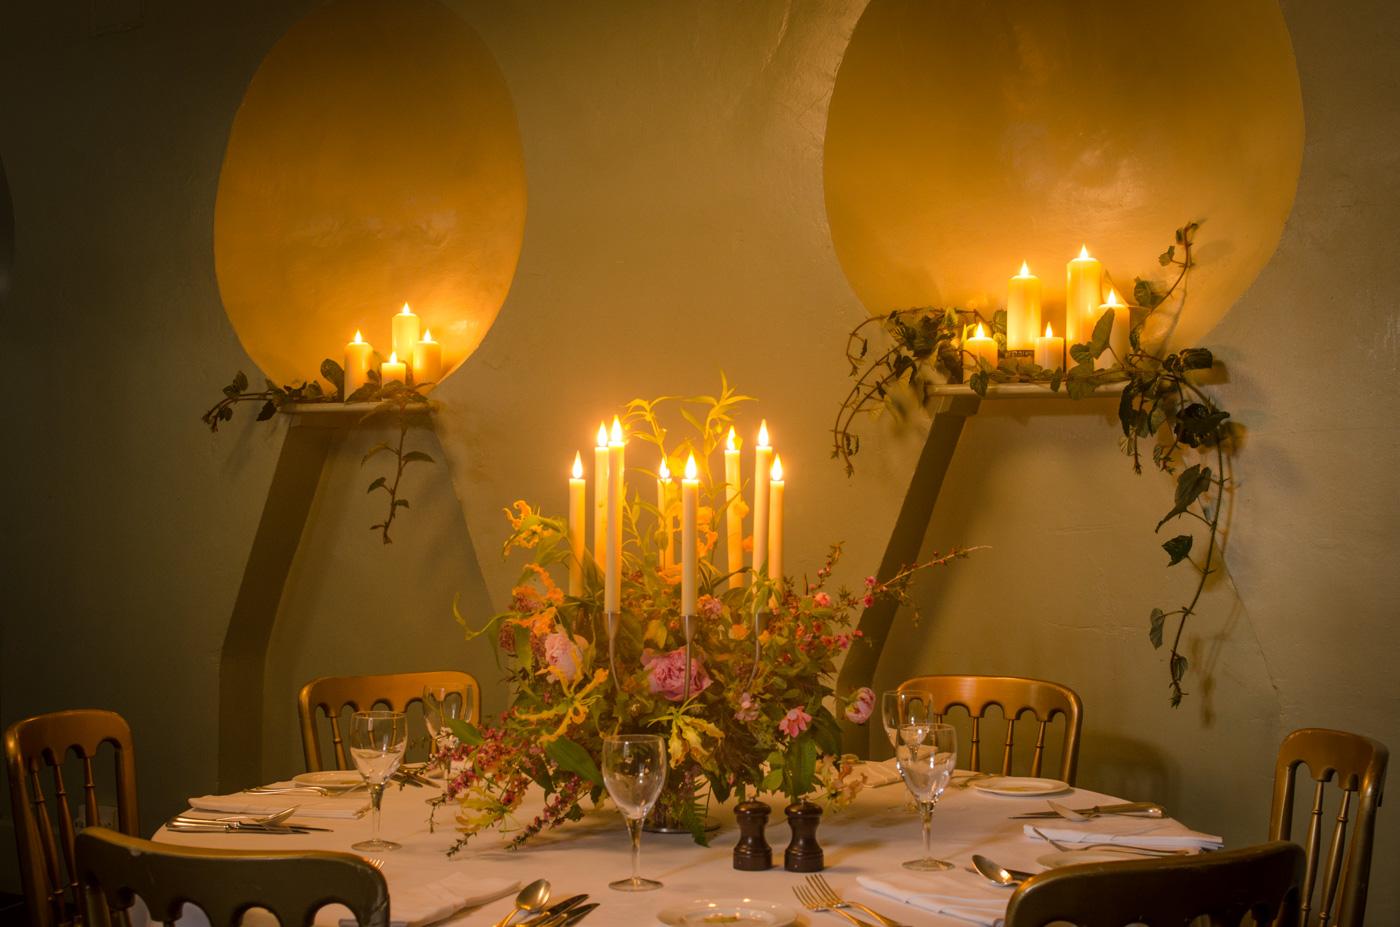 Candled Endsleigh Wedding Setup